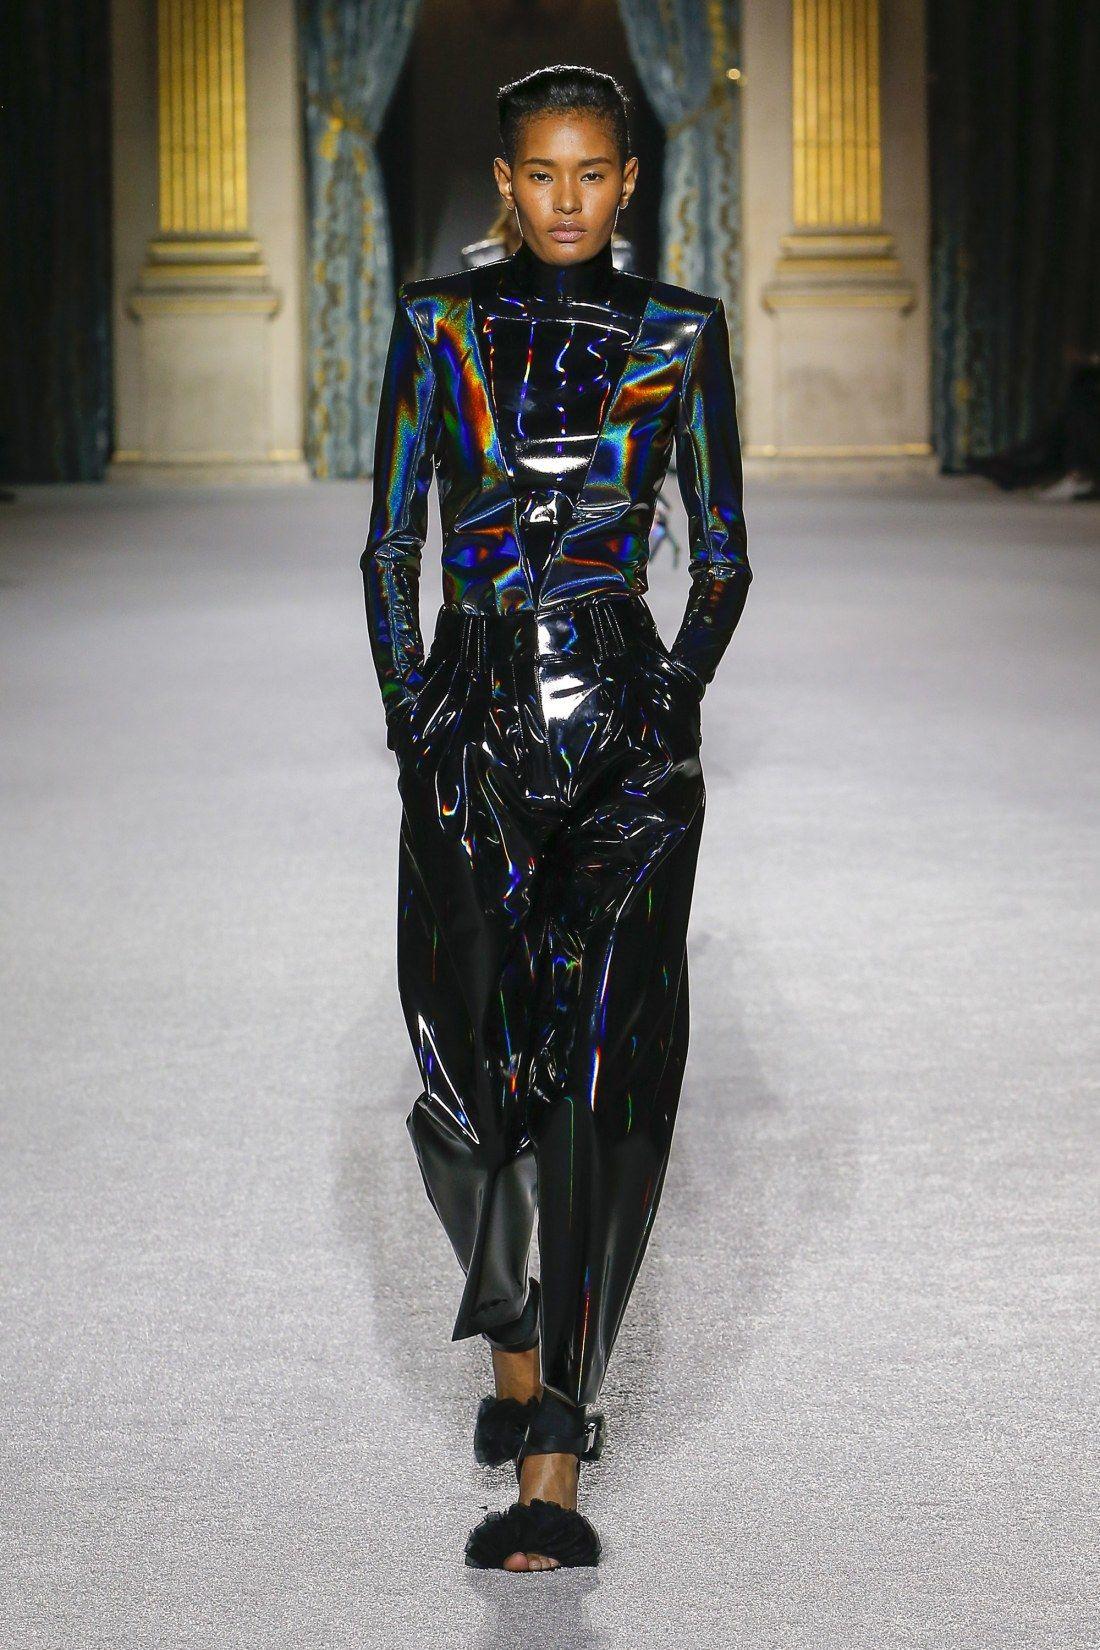 Why hasn't futuristic fashion evolved from retro-futurism ...